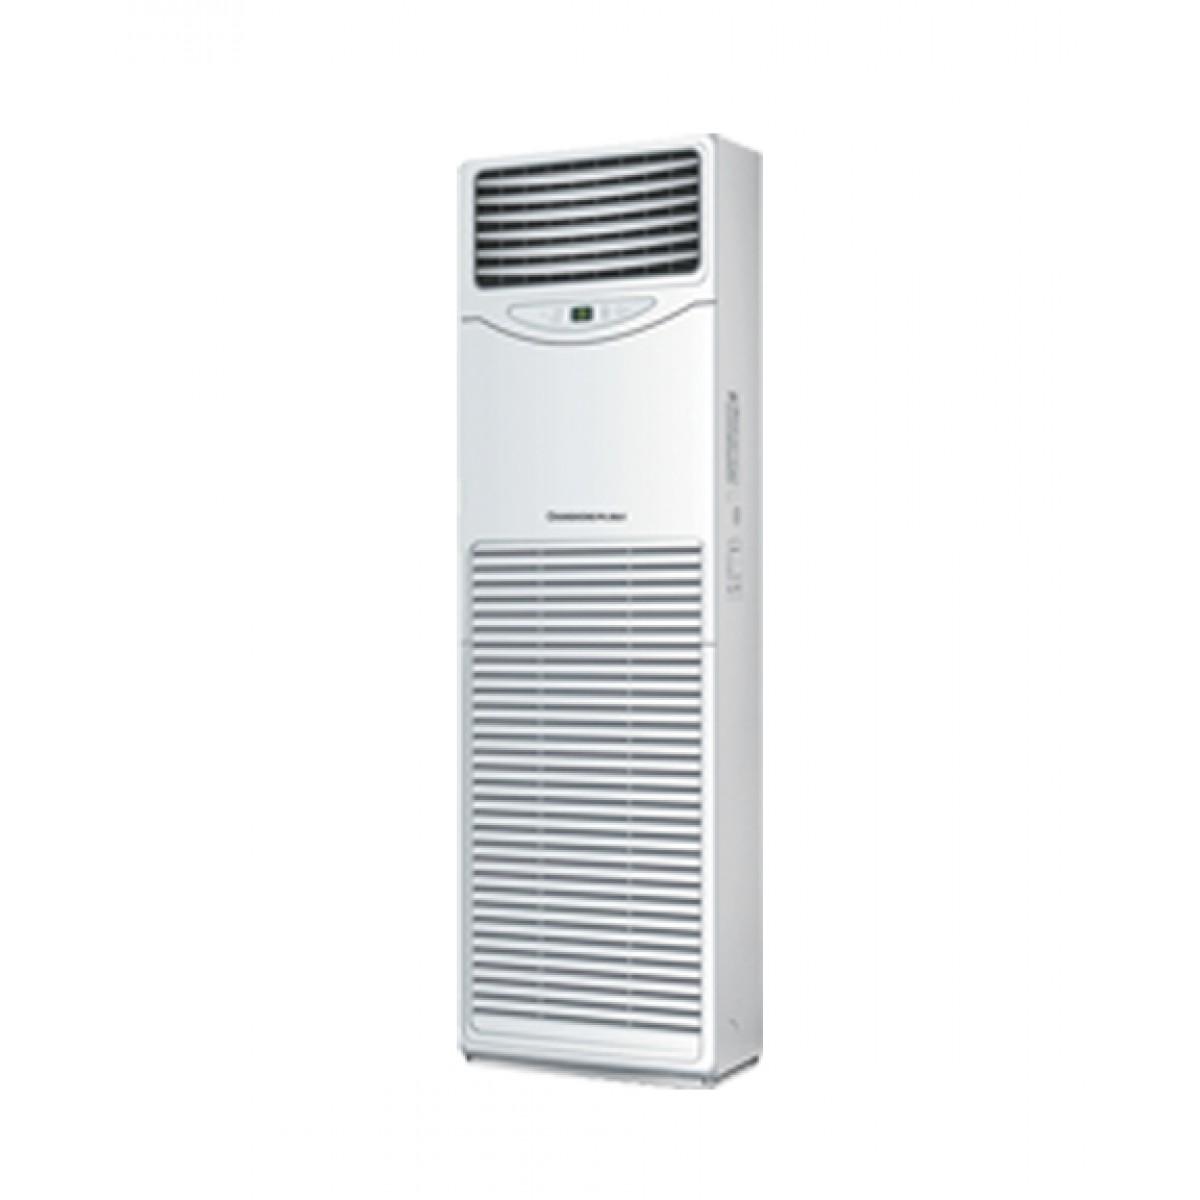 Changhong ruba floor standing air conditioner 4 0 ton kf for 1 ton floor standing ac